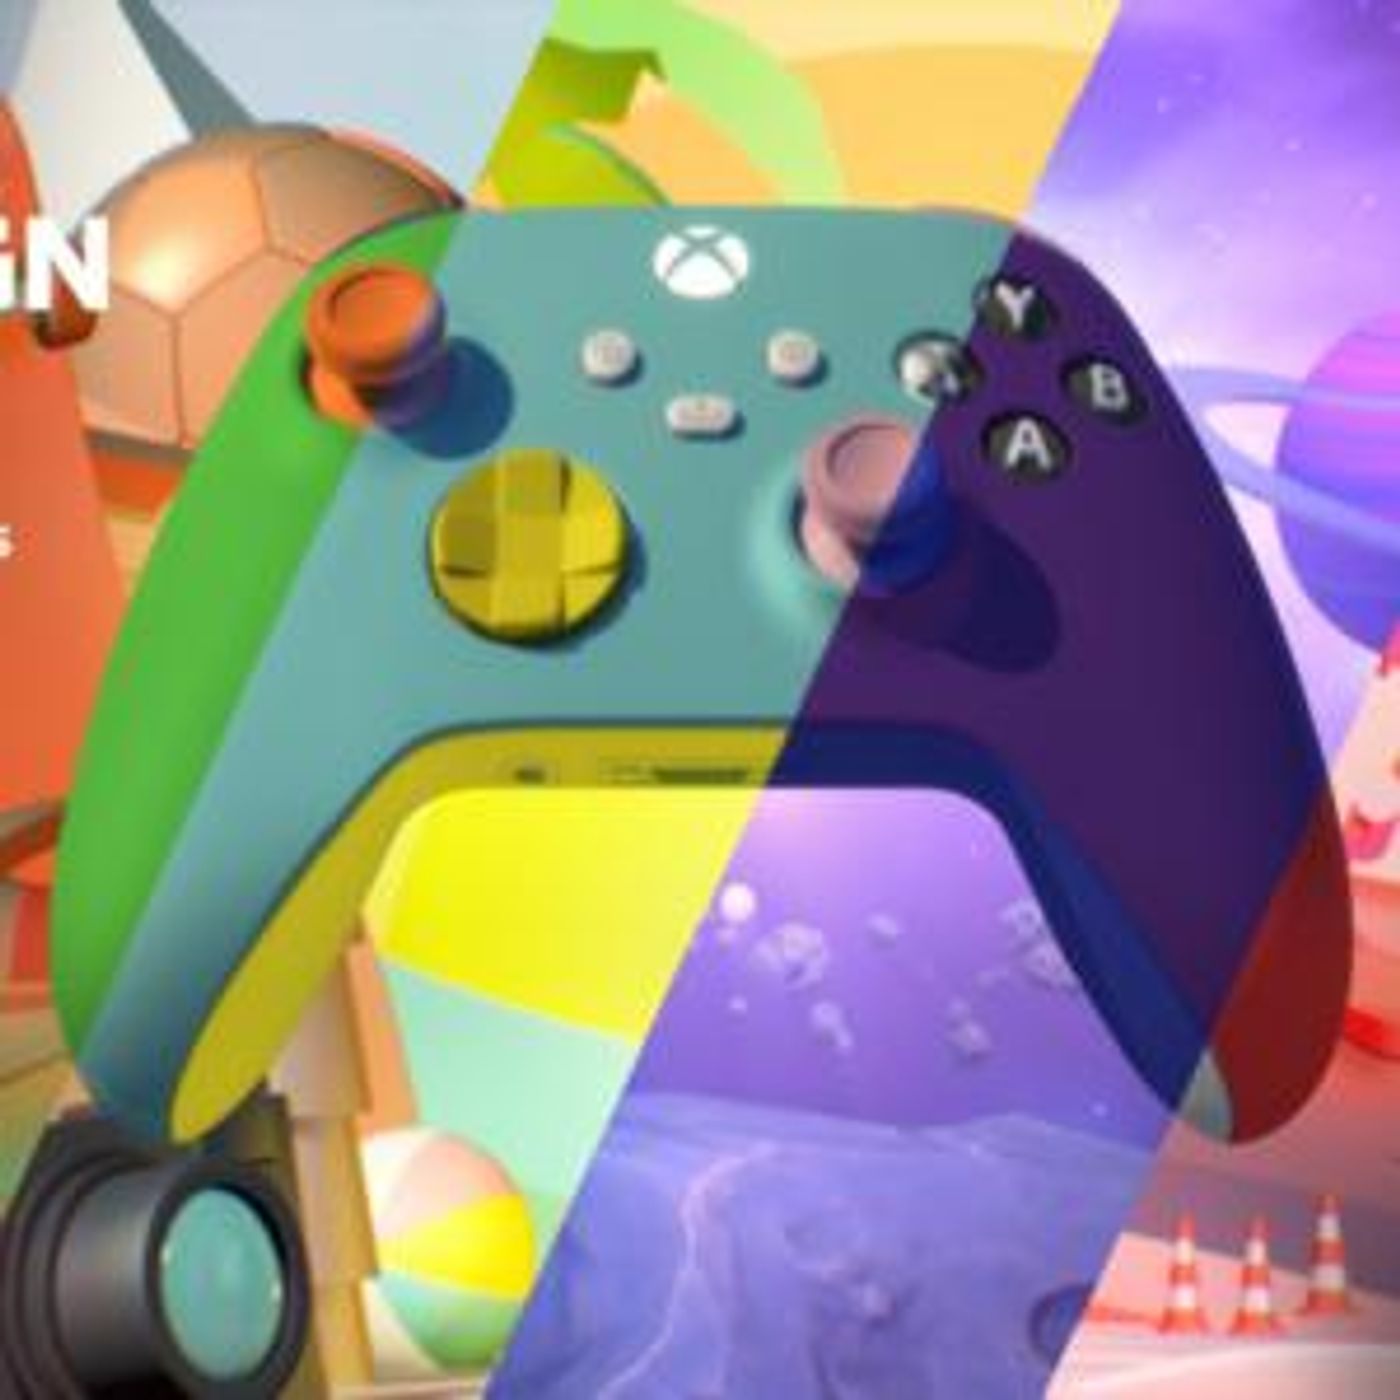 Crea tu propio control de Xbox